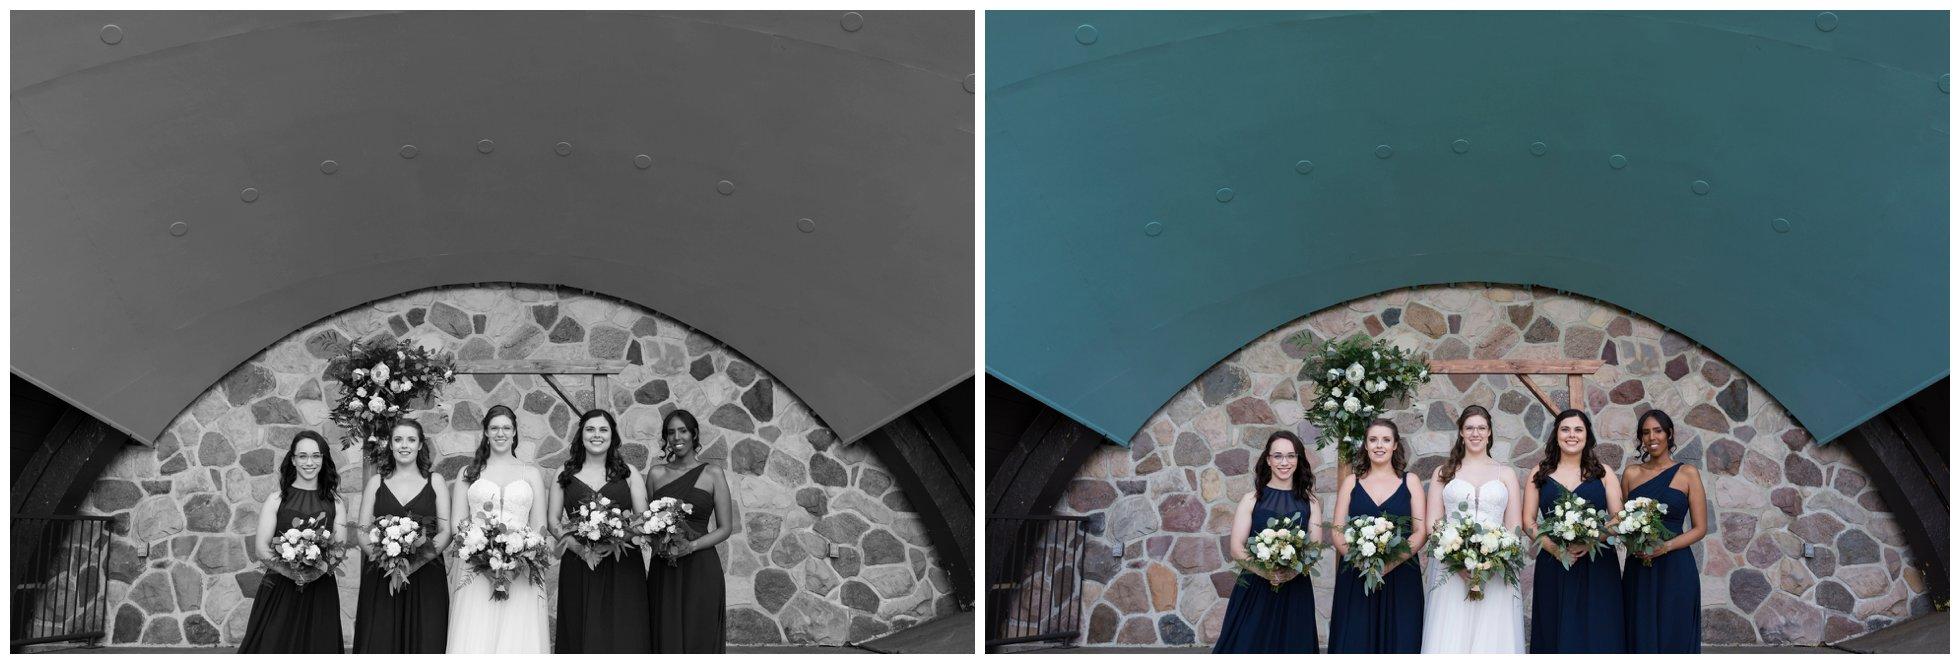 Emily and Royden Edmonton Wedding (Life by Selena Photography)_0027.jpg